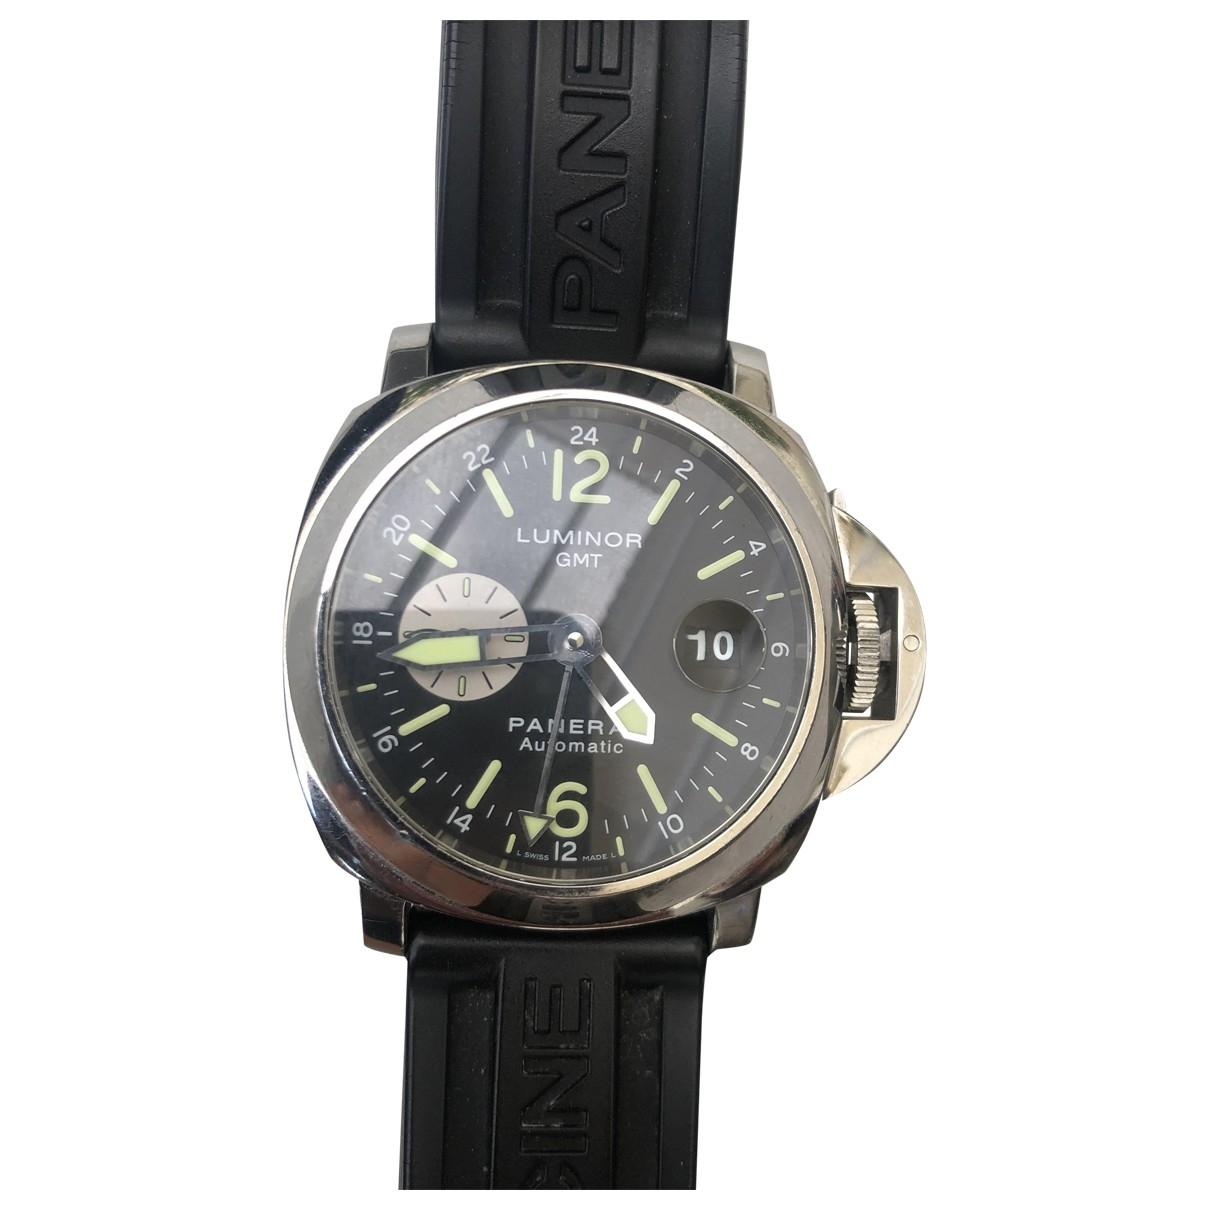 Panerai Luminor  Uhr in  Schwarz Stahl